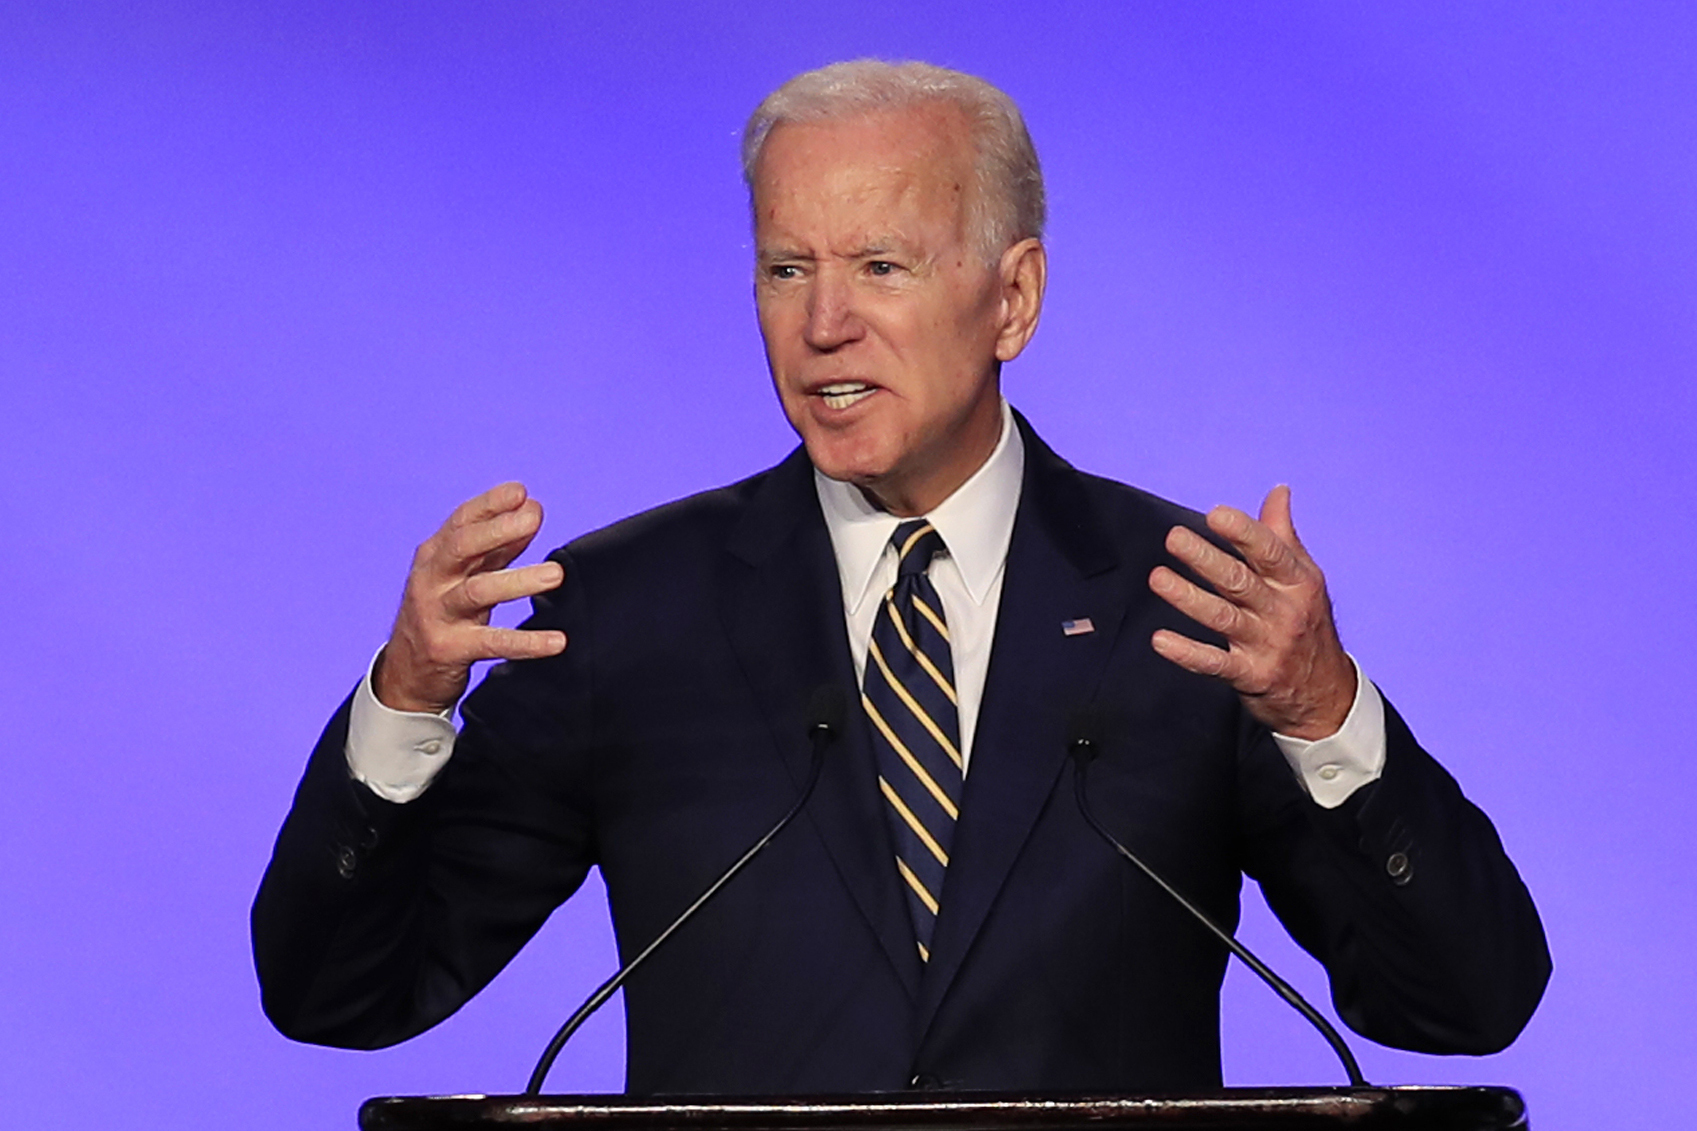 Election_2020_Joe_Biden_51589-159532.jpg93629490